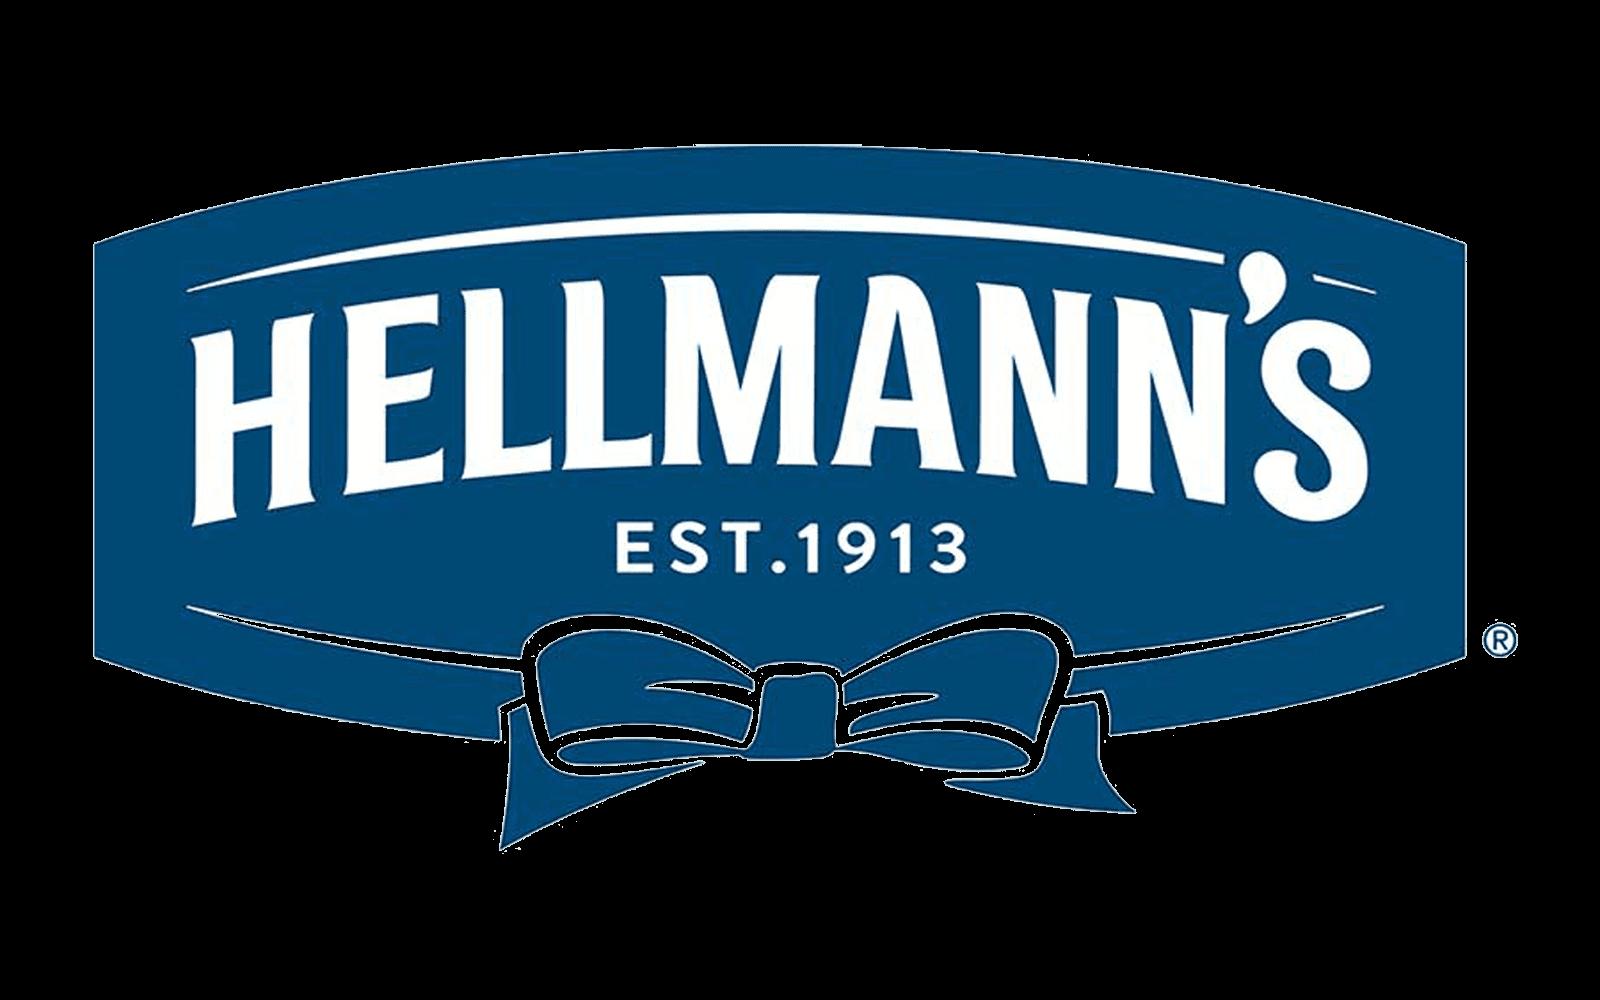 Hellmann's Mayonnaise, 11,/924 Cases, Ext. Retail $141,100, Jacksonville, FL